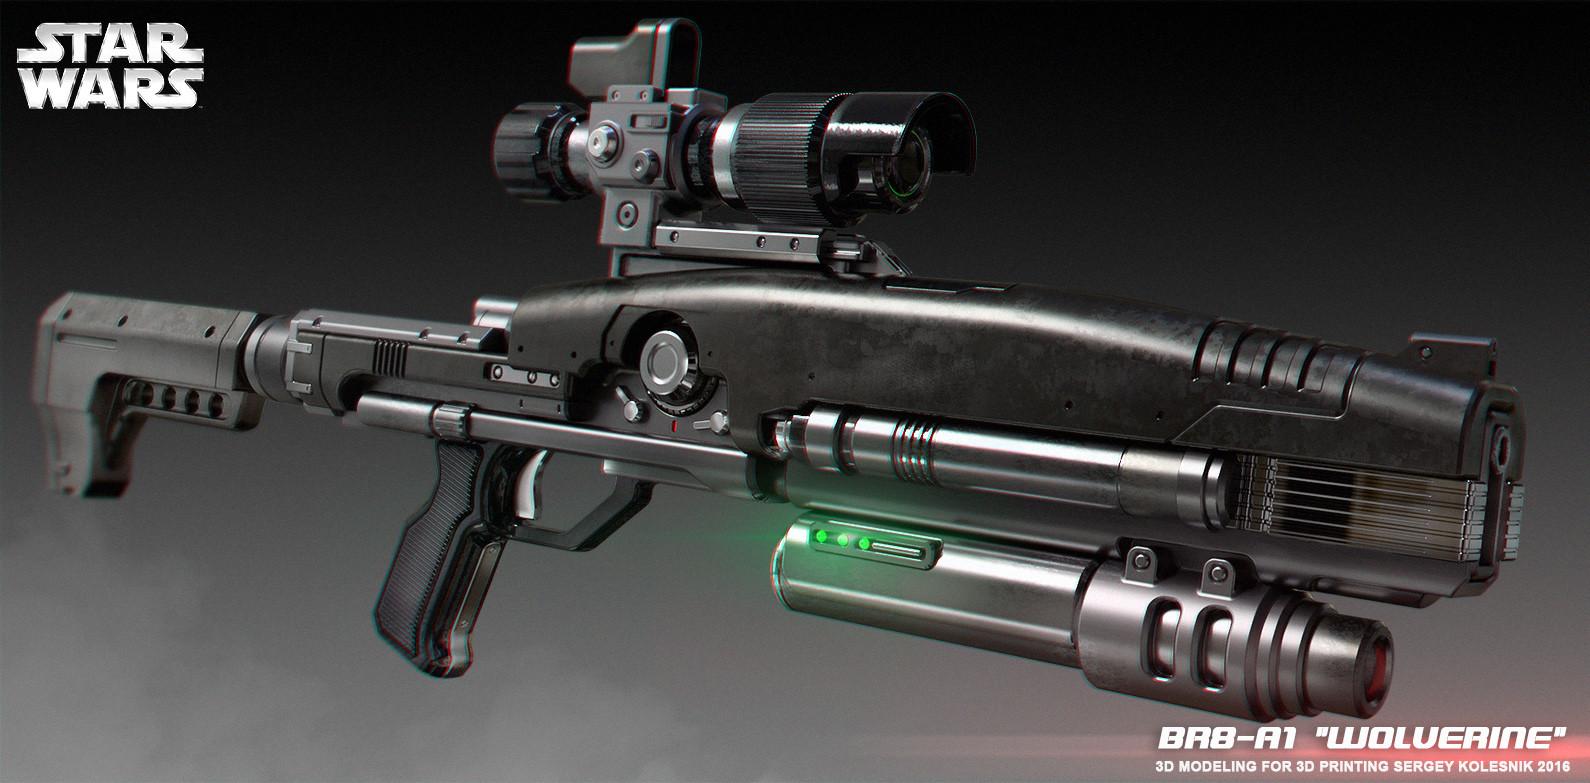 sergey-kolesnik-br8-a1-blaster-rifle1.jpg